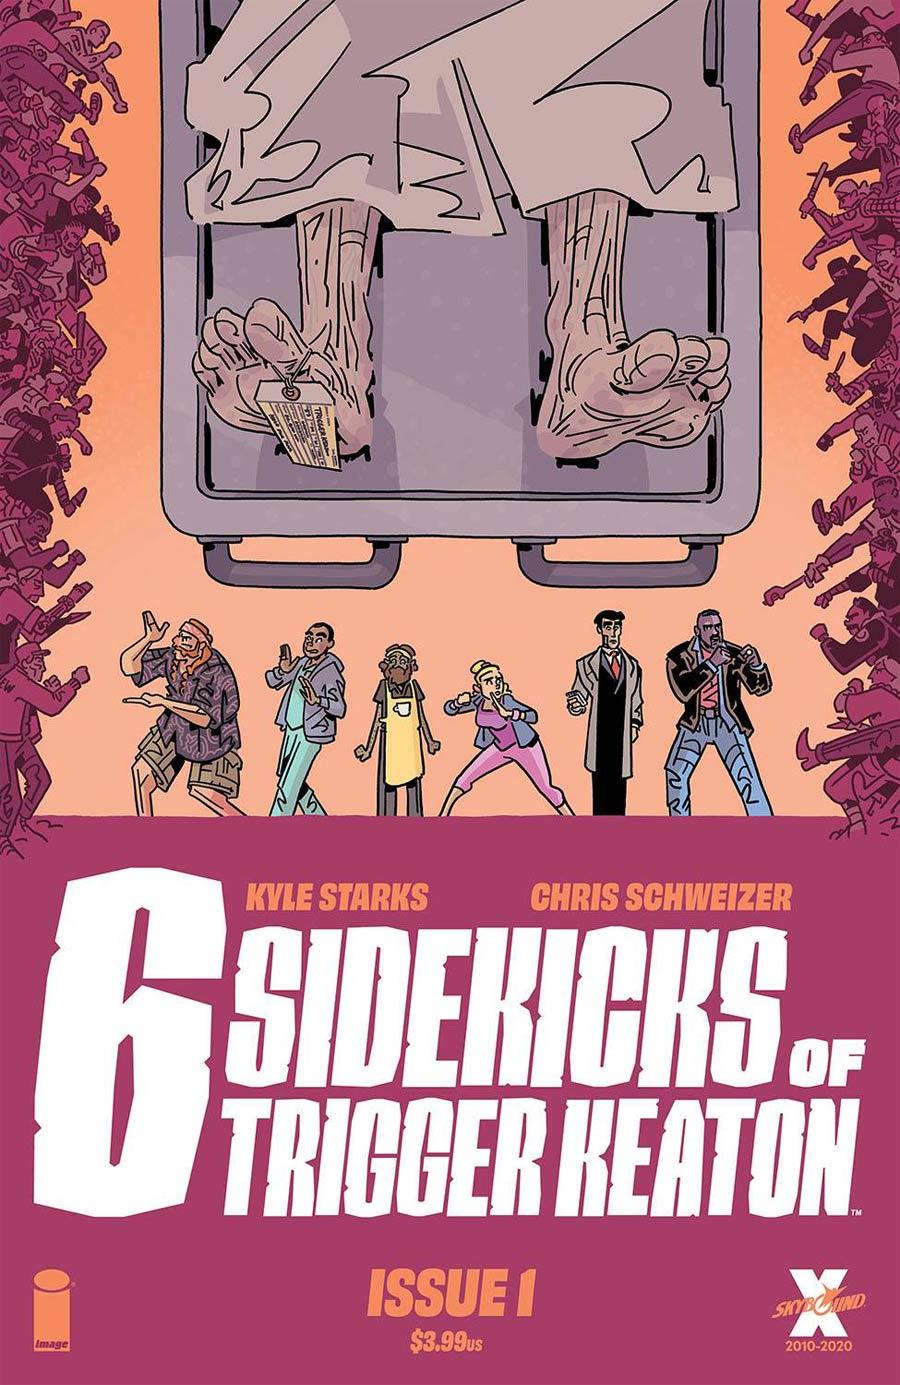 Six Sidekicks Of Trigger Keaton #1 Cover A Regular Chris Schweizer Cover